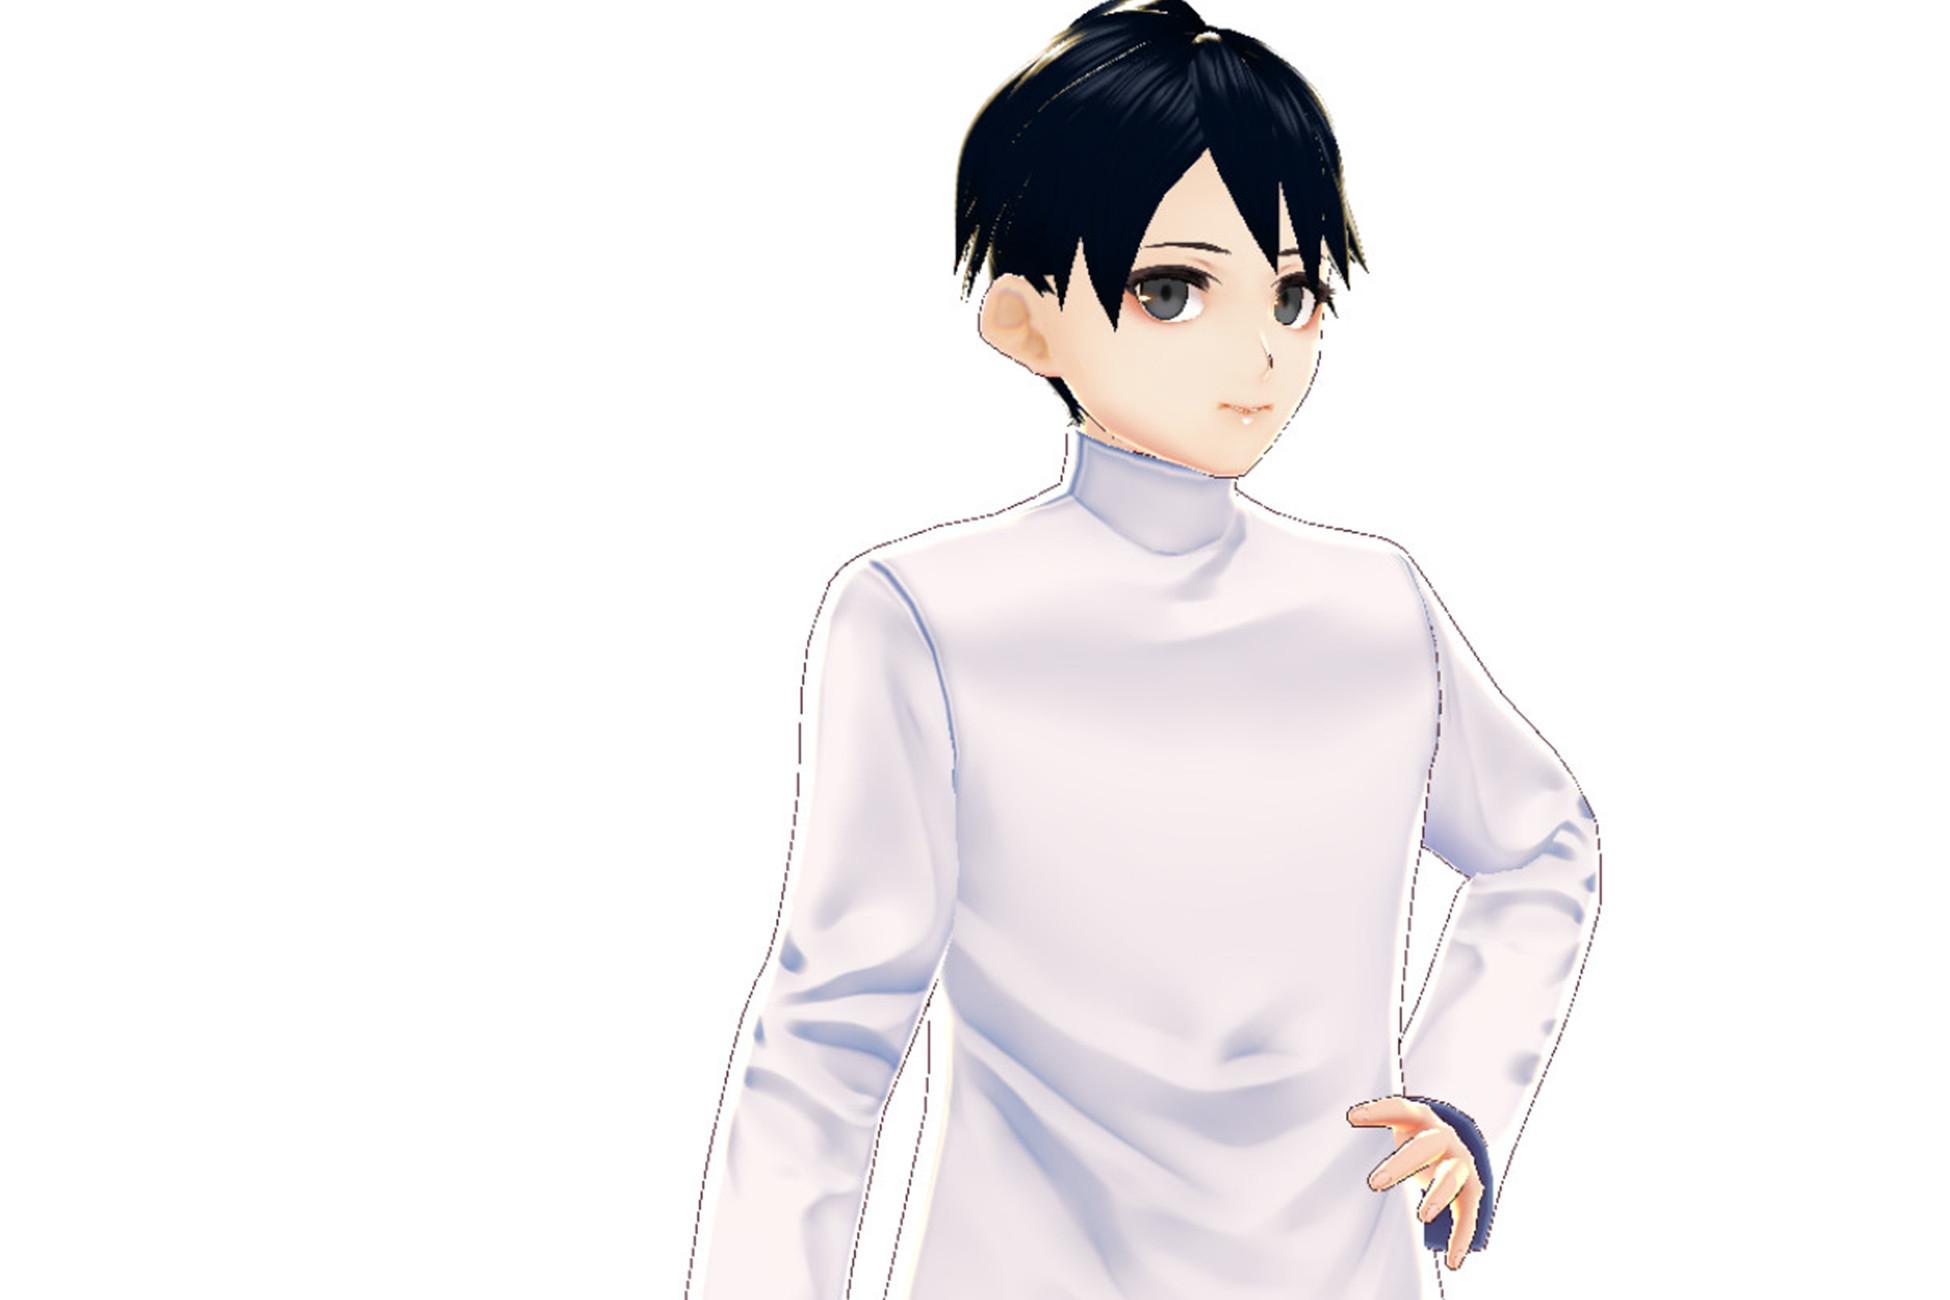 Anime Character : Yong (Moon Light + Uniform)